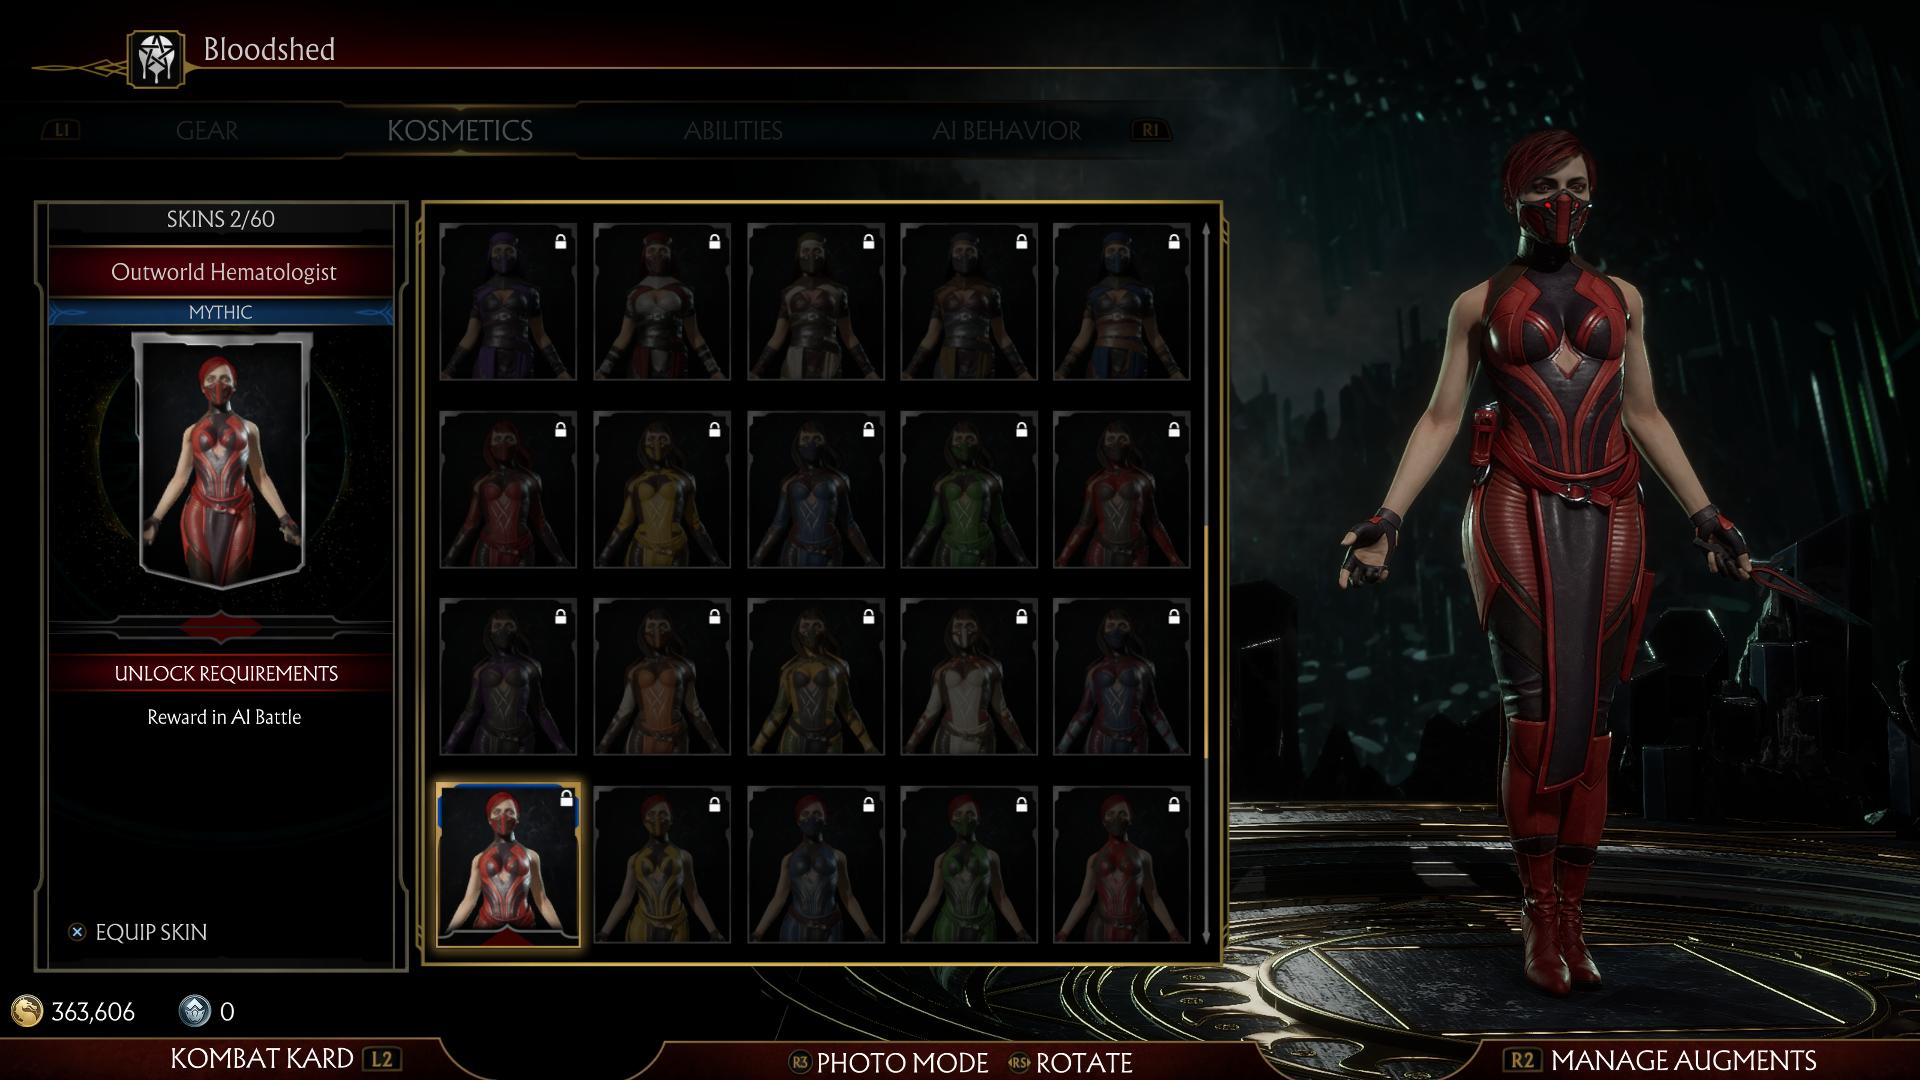 Скарлетт - Mortal Kombat 11